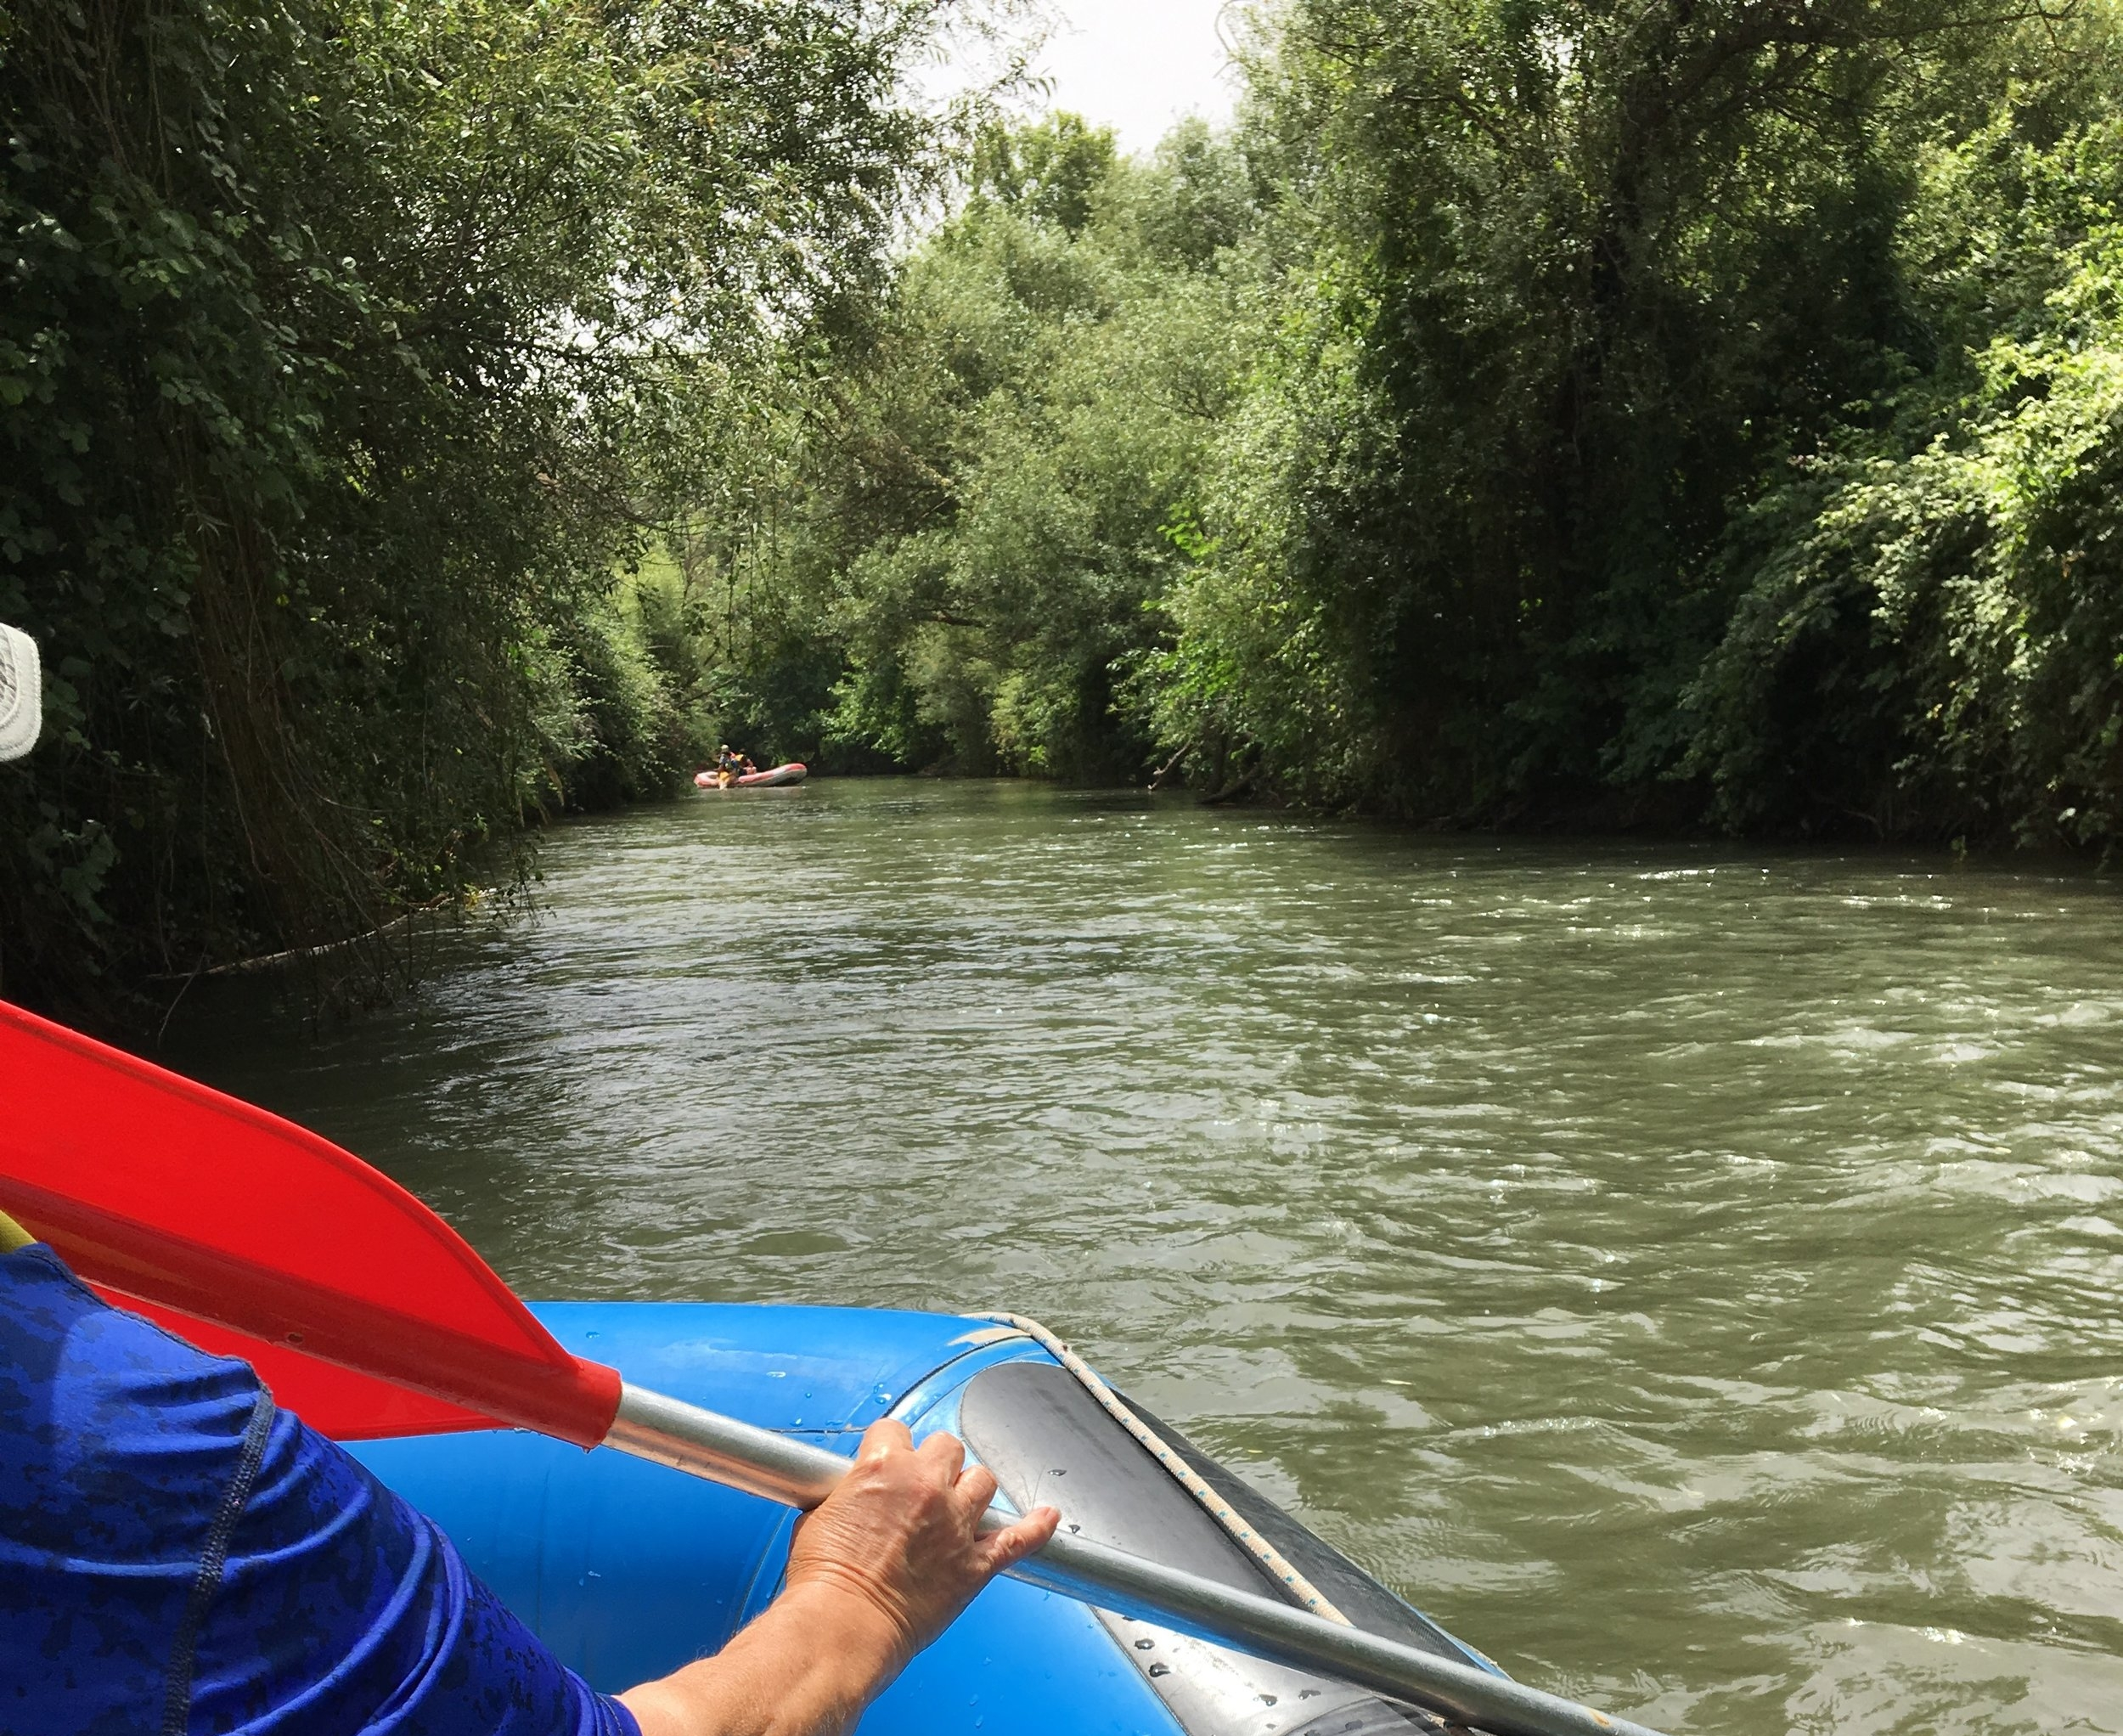 White-water rafting on the Jordan River